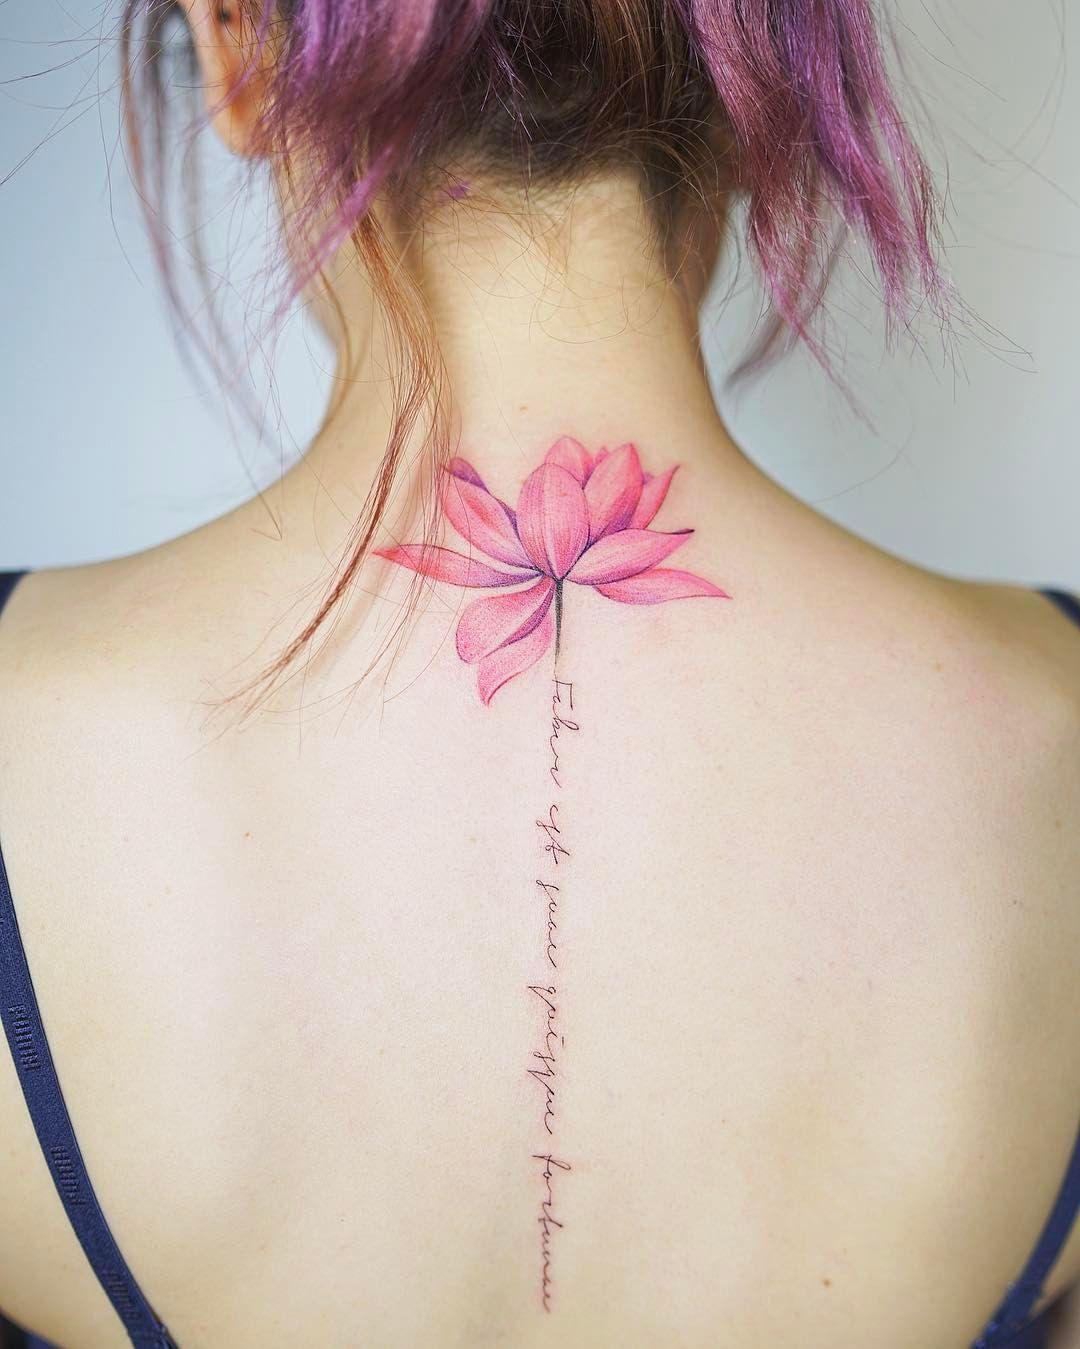 Pin By Abri Skye On Tattoos Pinterest Tattoos Flower Tattoos